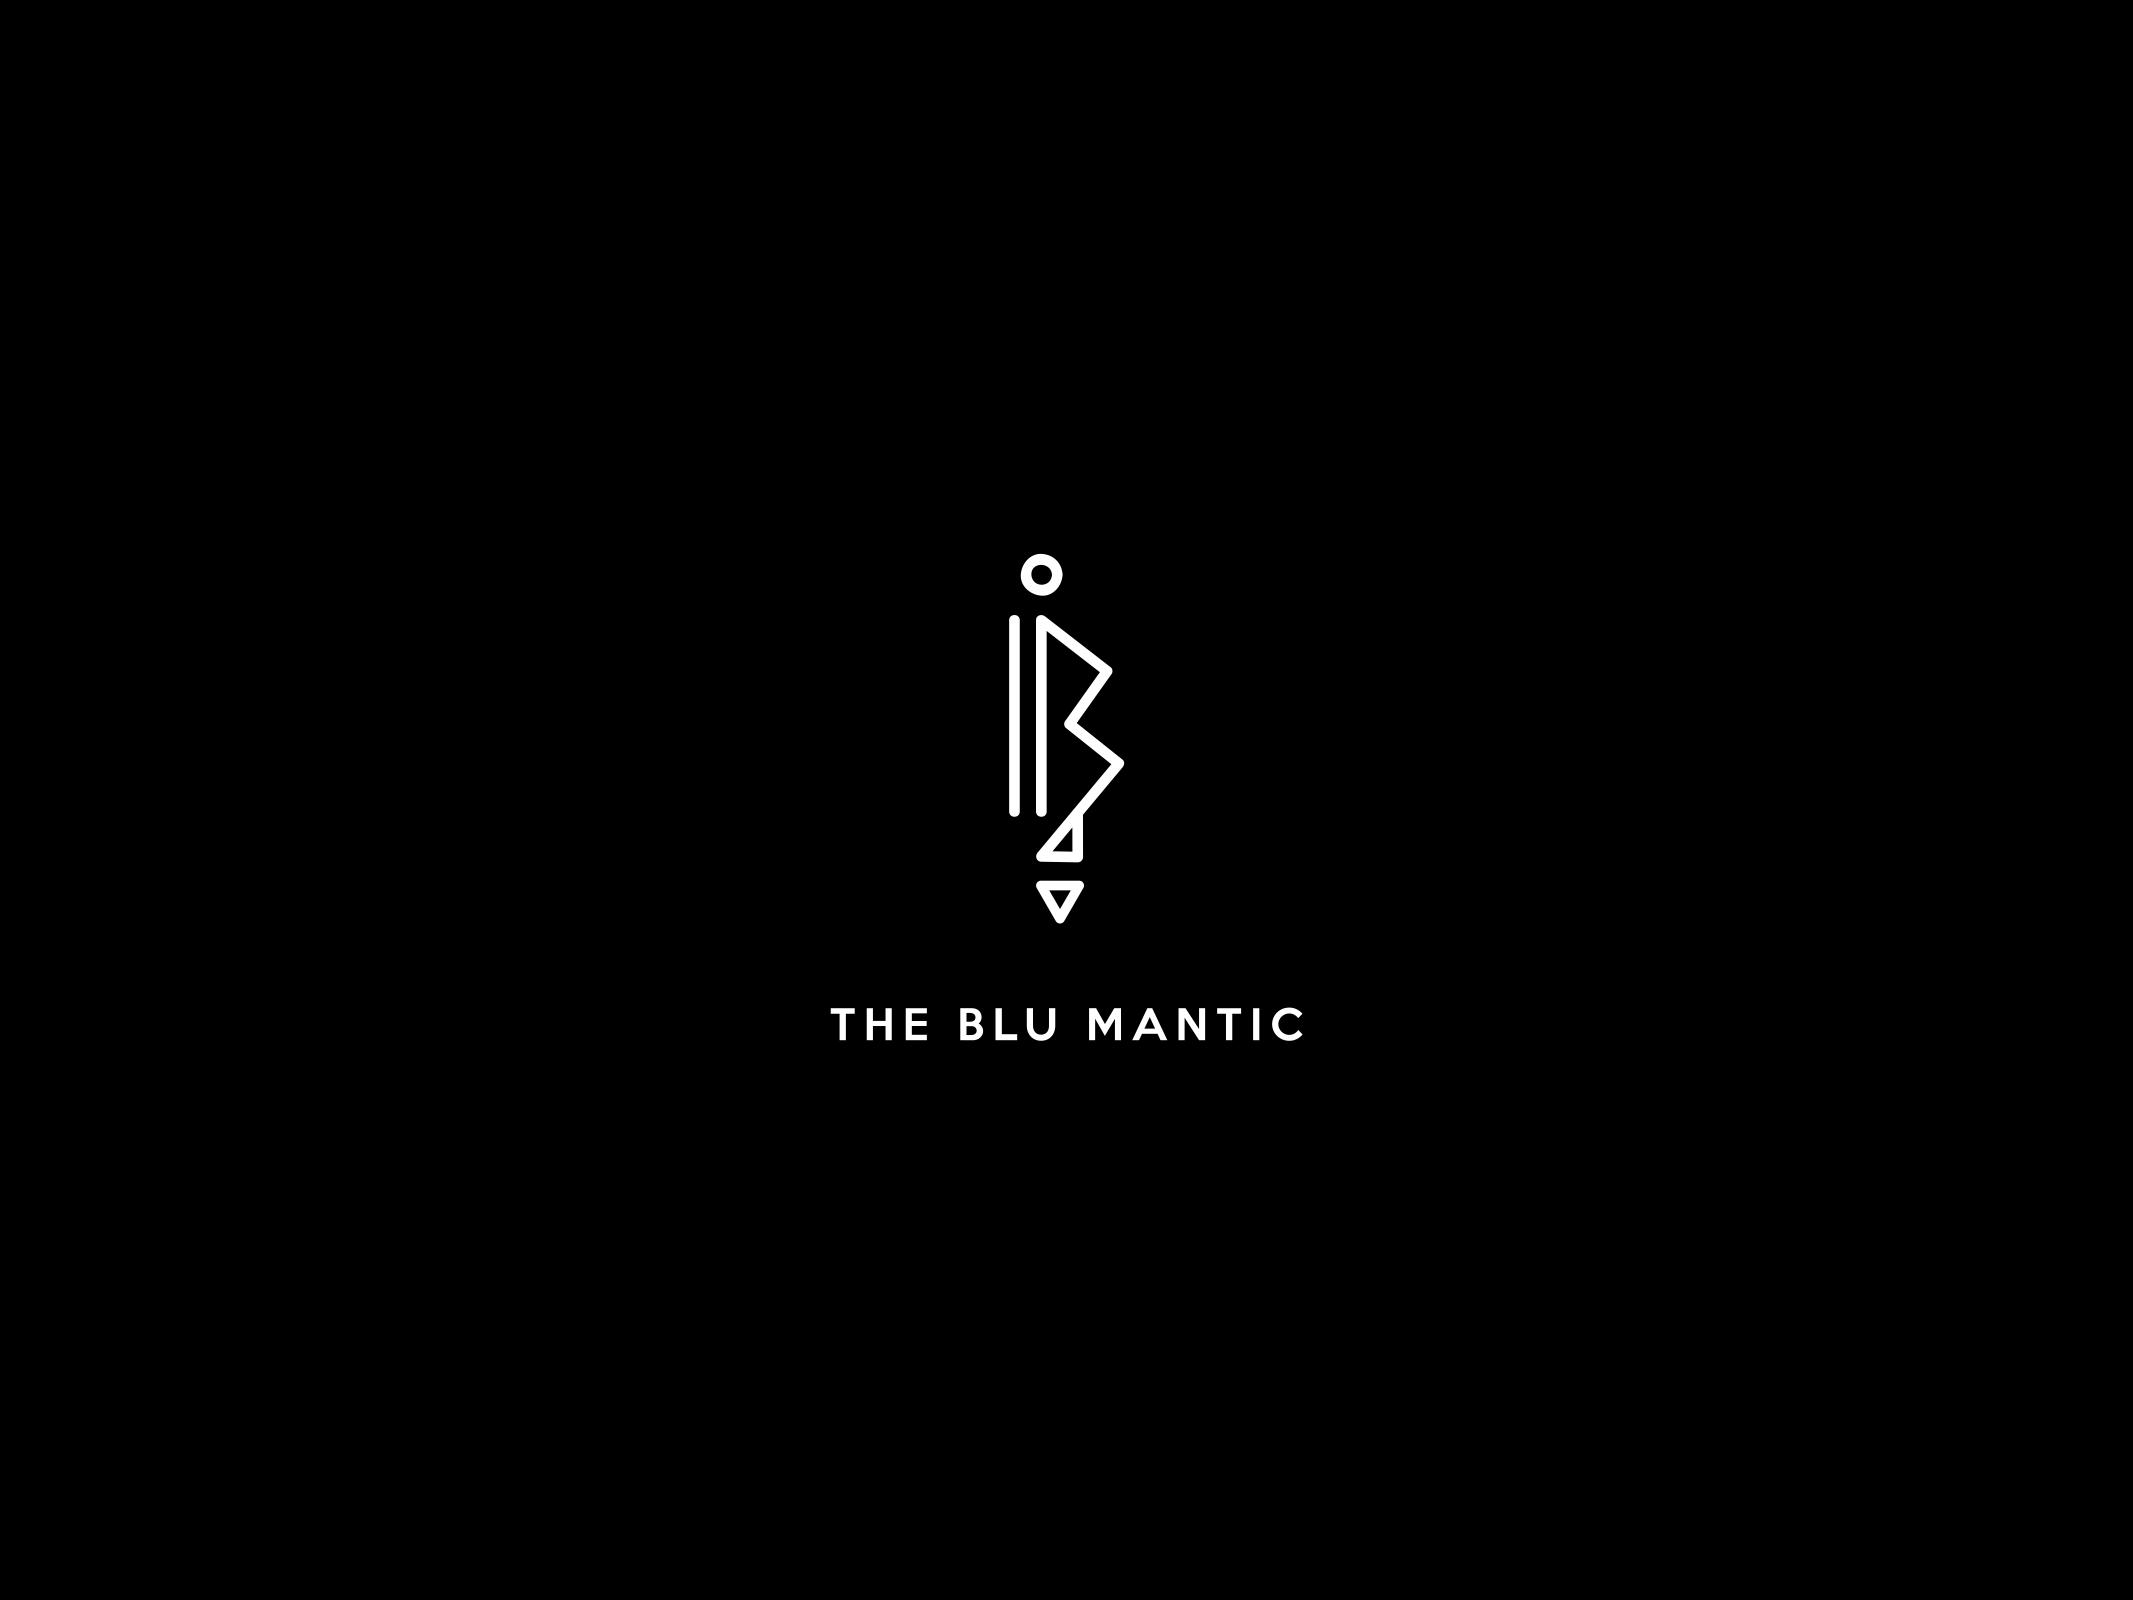 Blu mantic blk